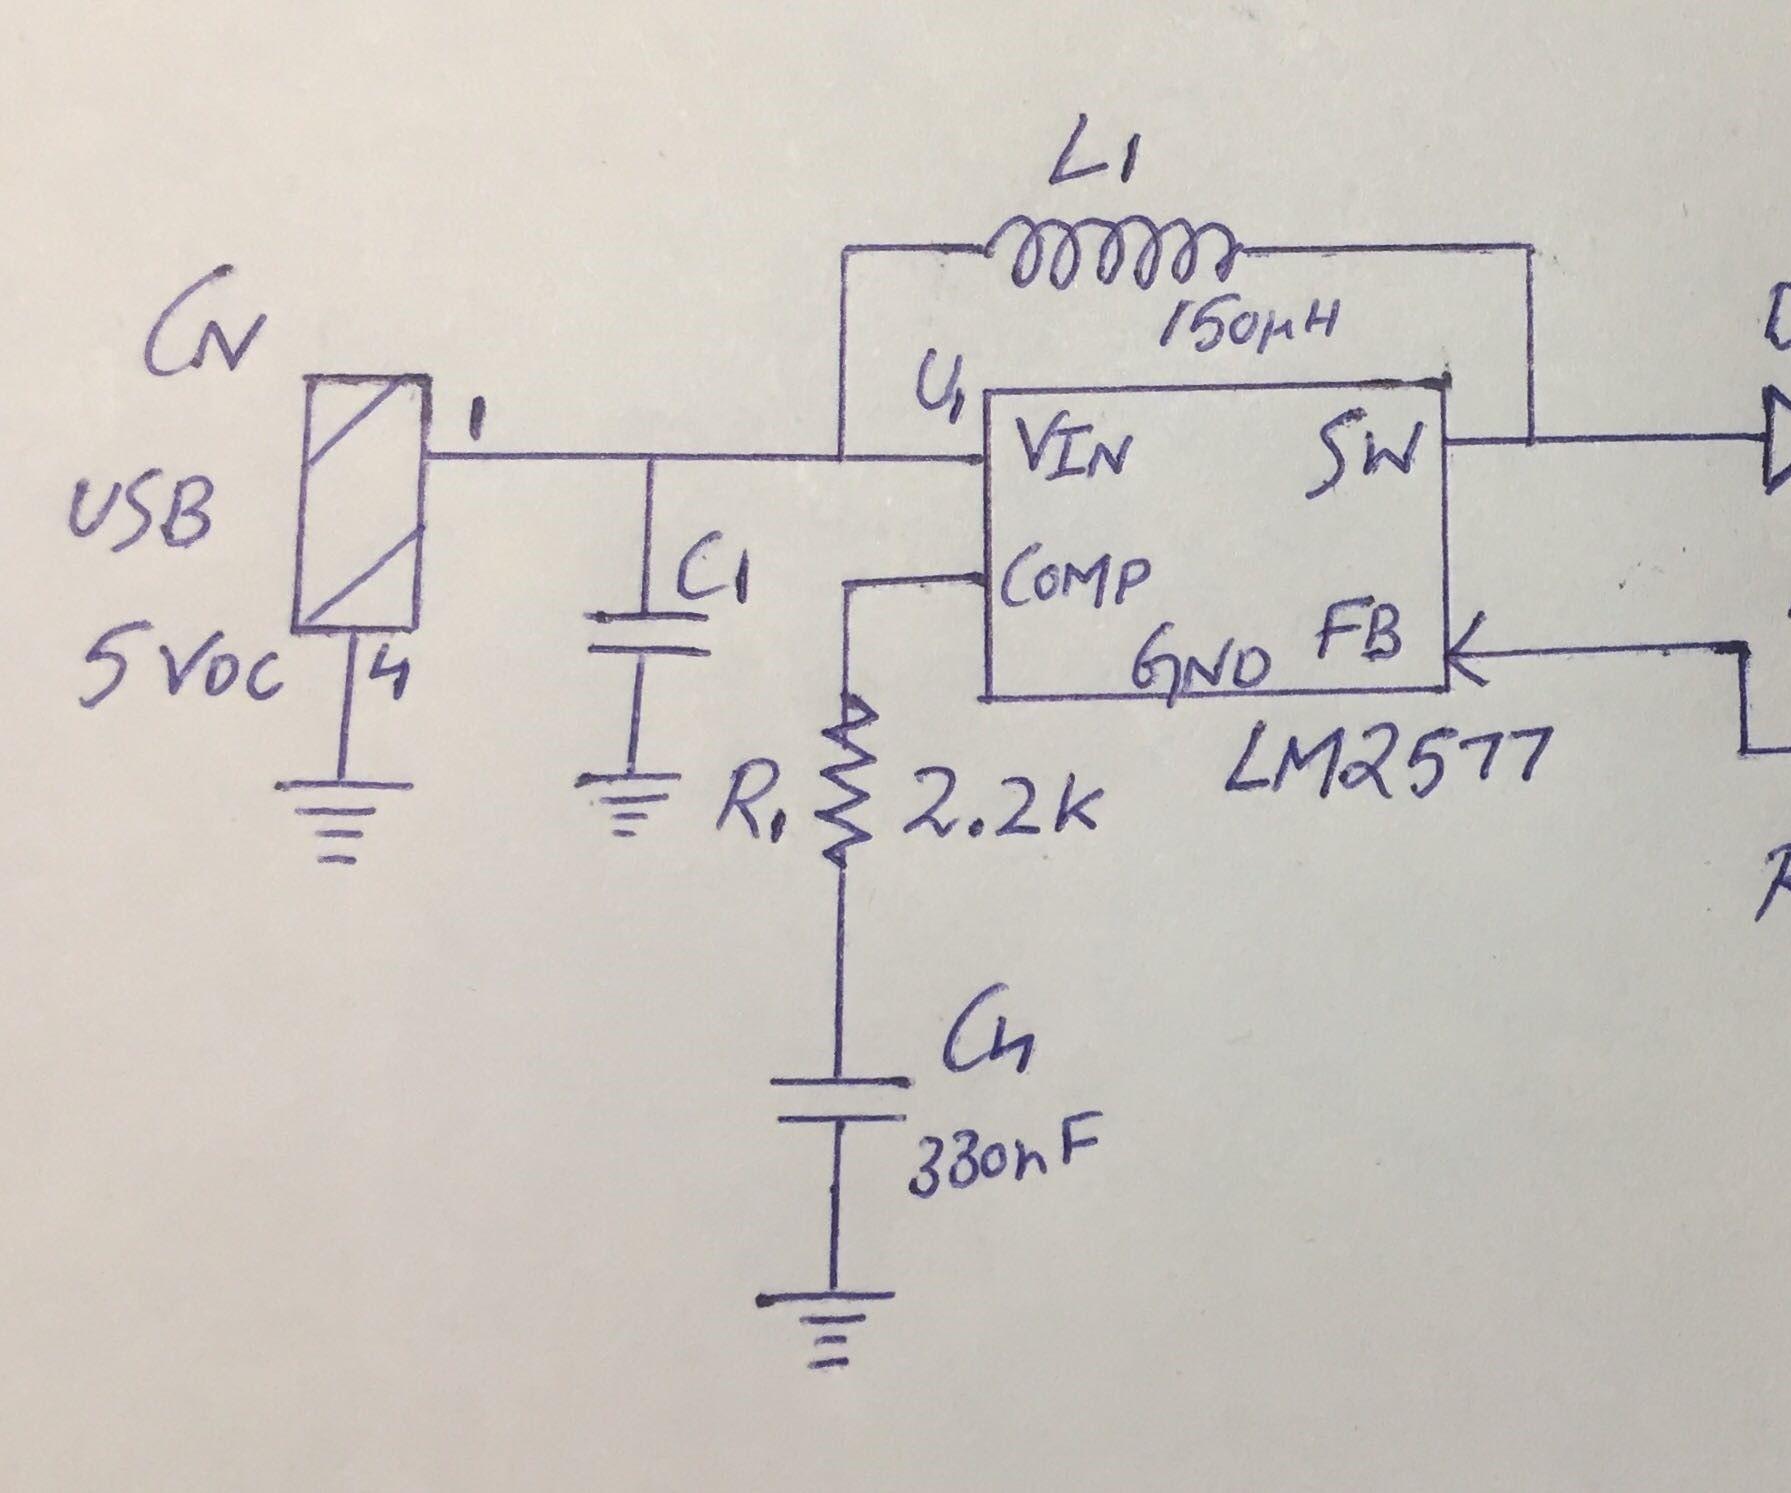 USB TO 12-V CONVERTER (Part-1)